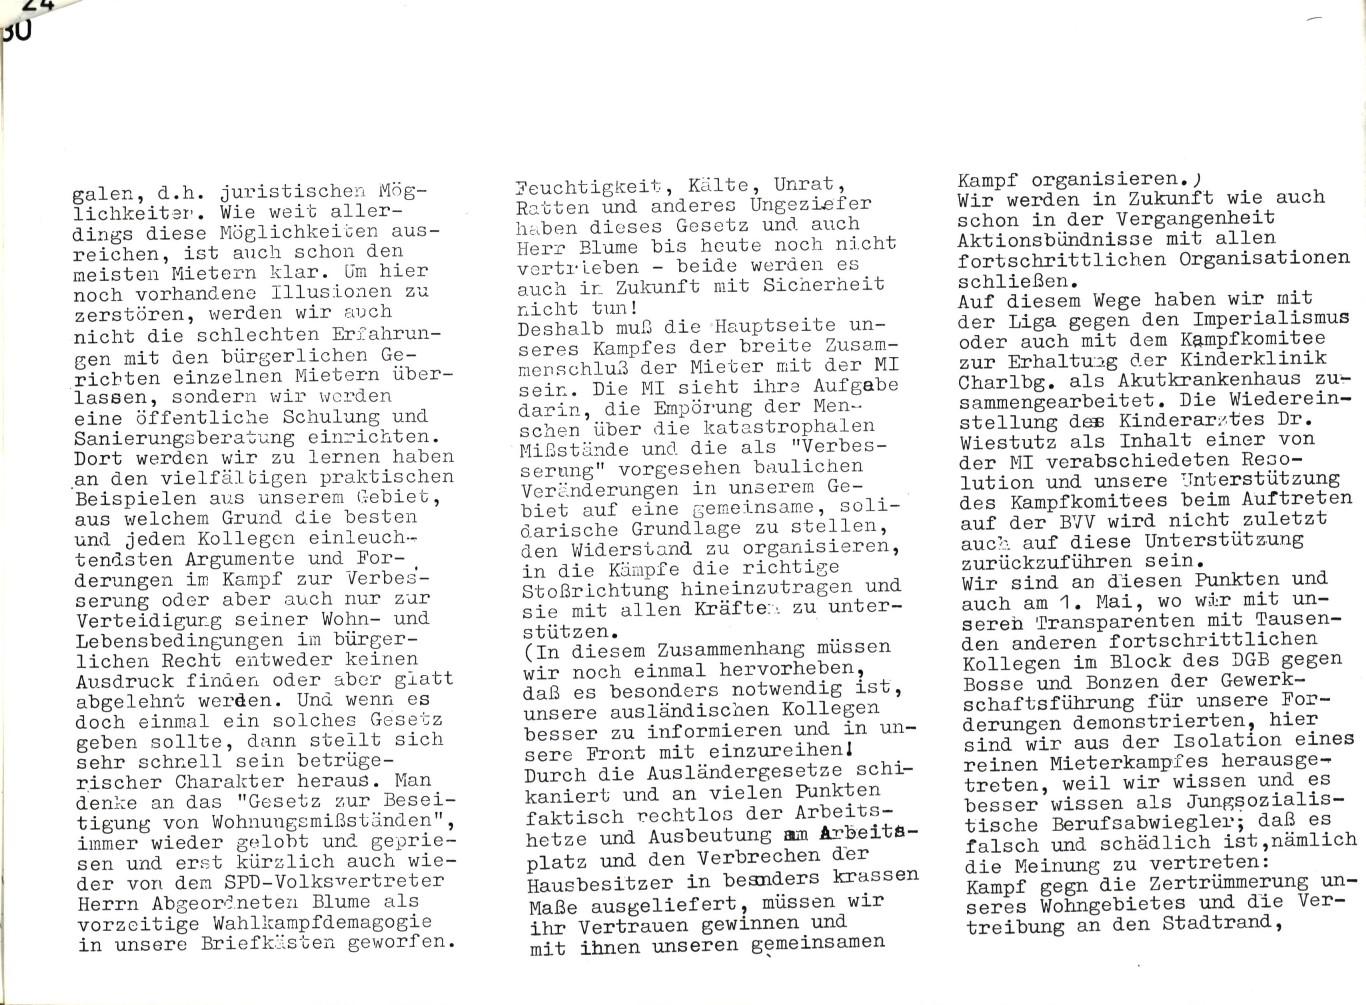 Berlin_KSV_1974_Rote_Bauwochen_41